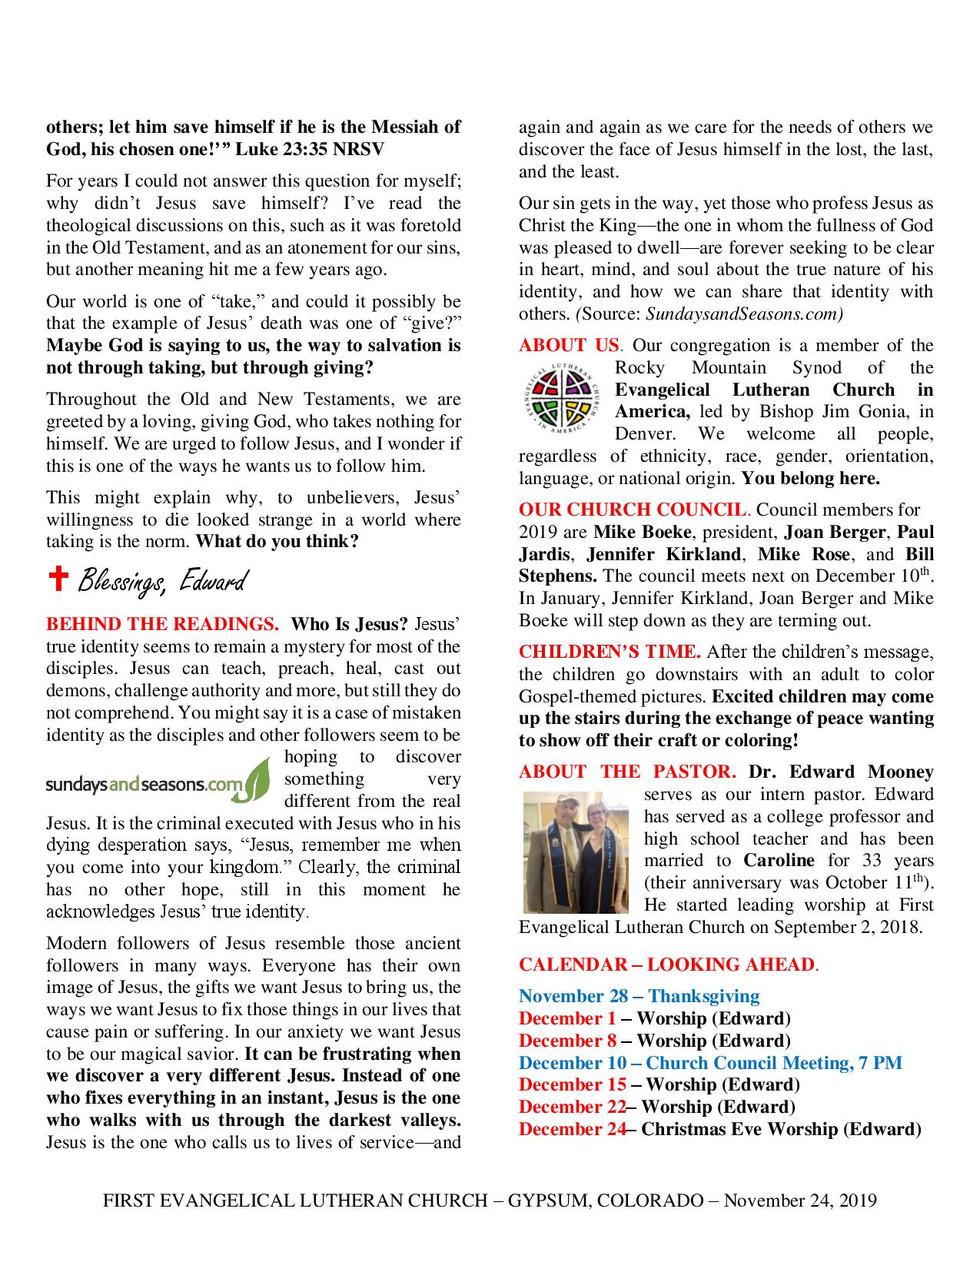 Newsletter, November 24, 2019, page 2